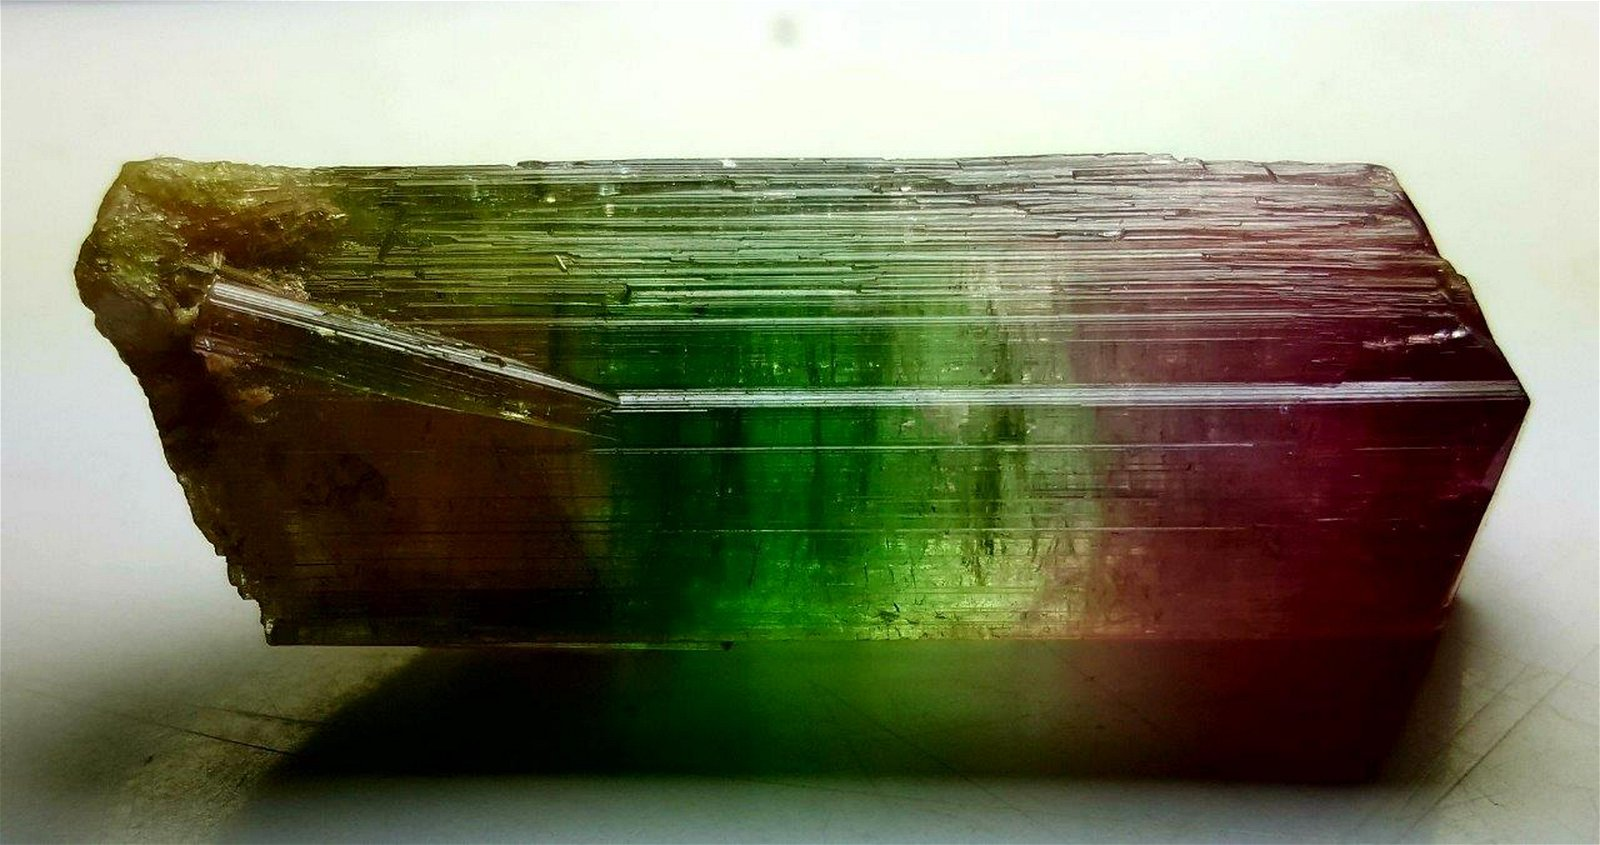 94.5 Carats Double Terminated Tourmaline Crystal